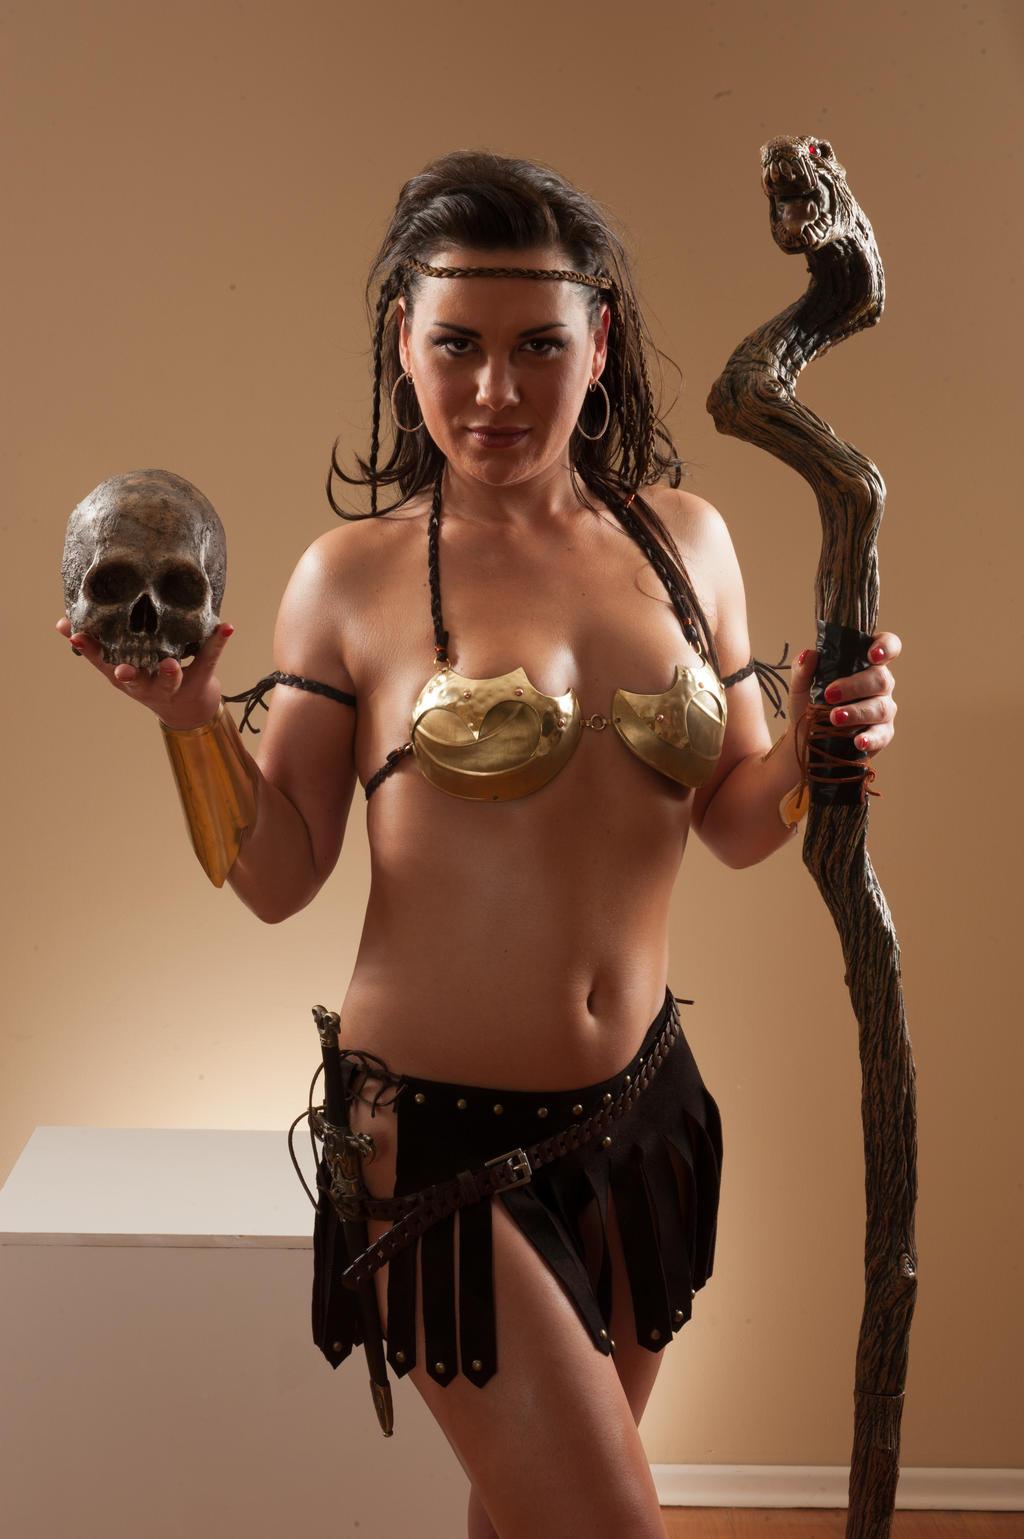 Nelli Warrior-3925 by jagged-eye